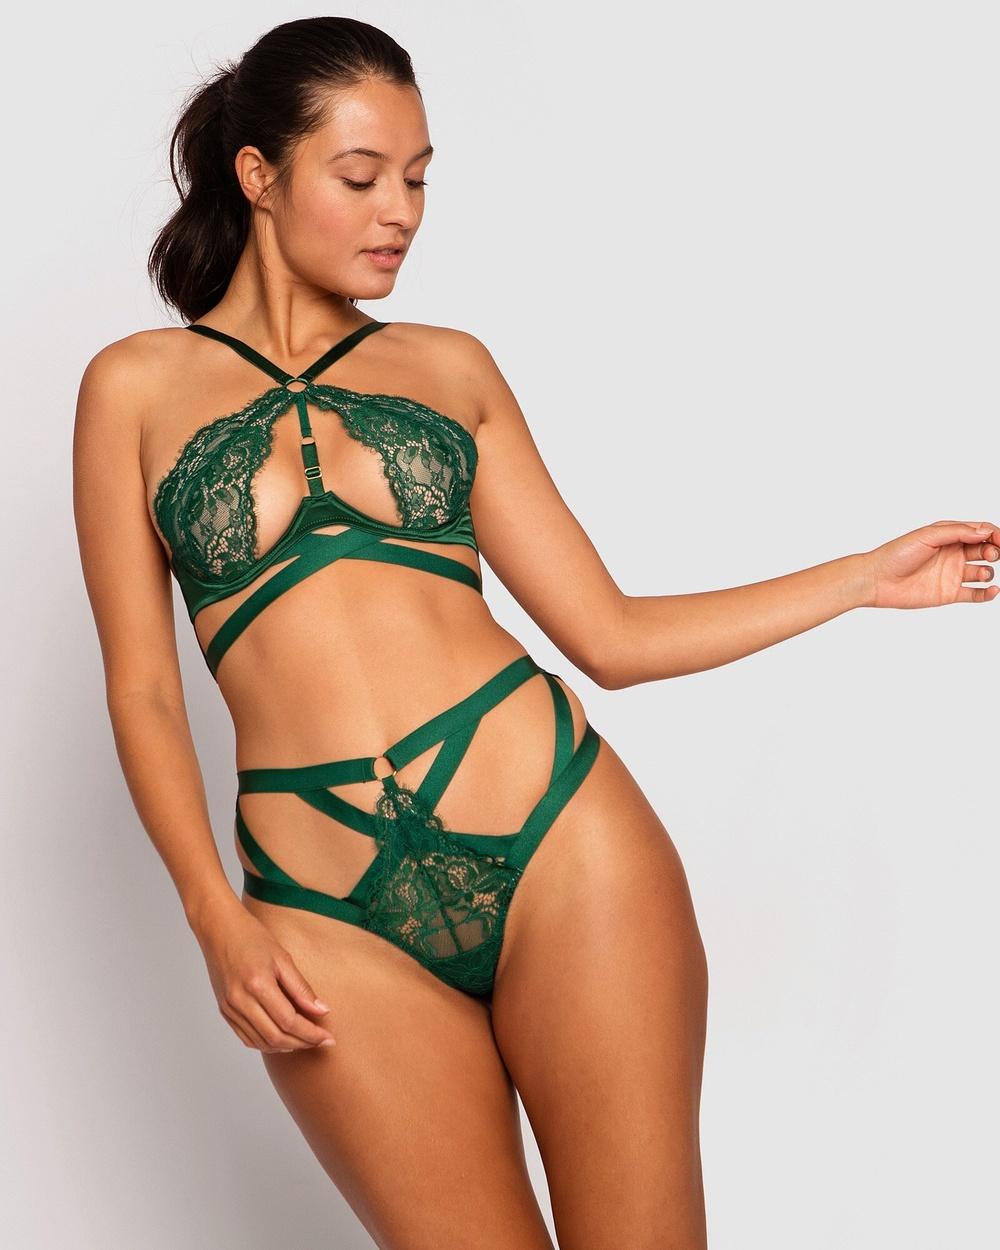 Bras N Things Shiloh High Waisted Brazilian Knicker Lingerie Dark Green Australia